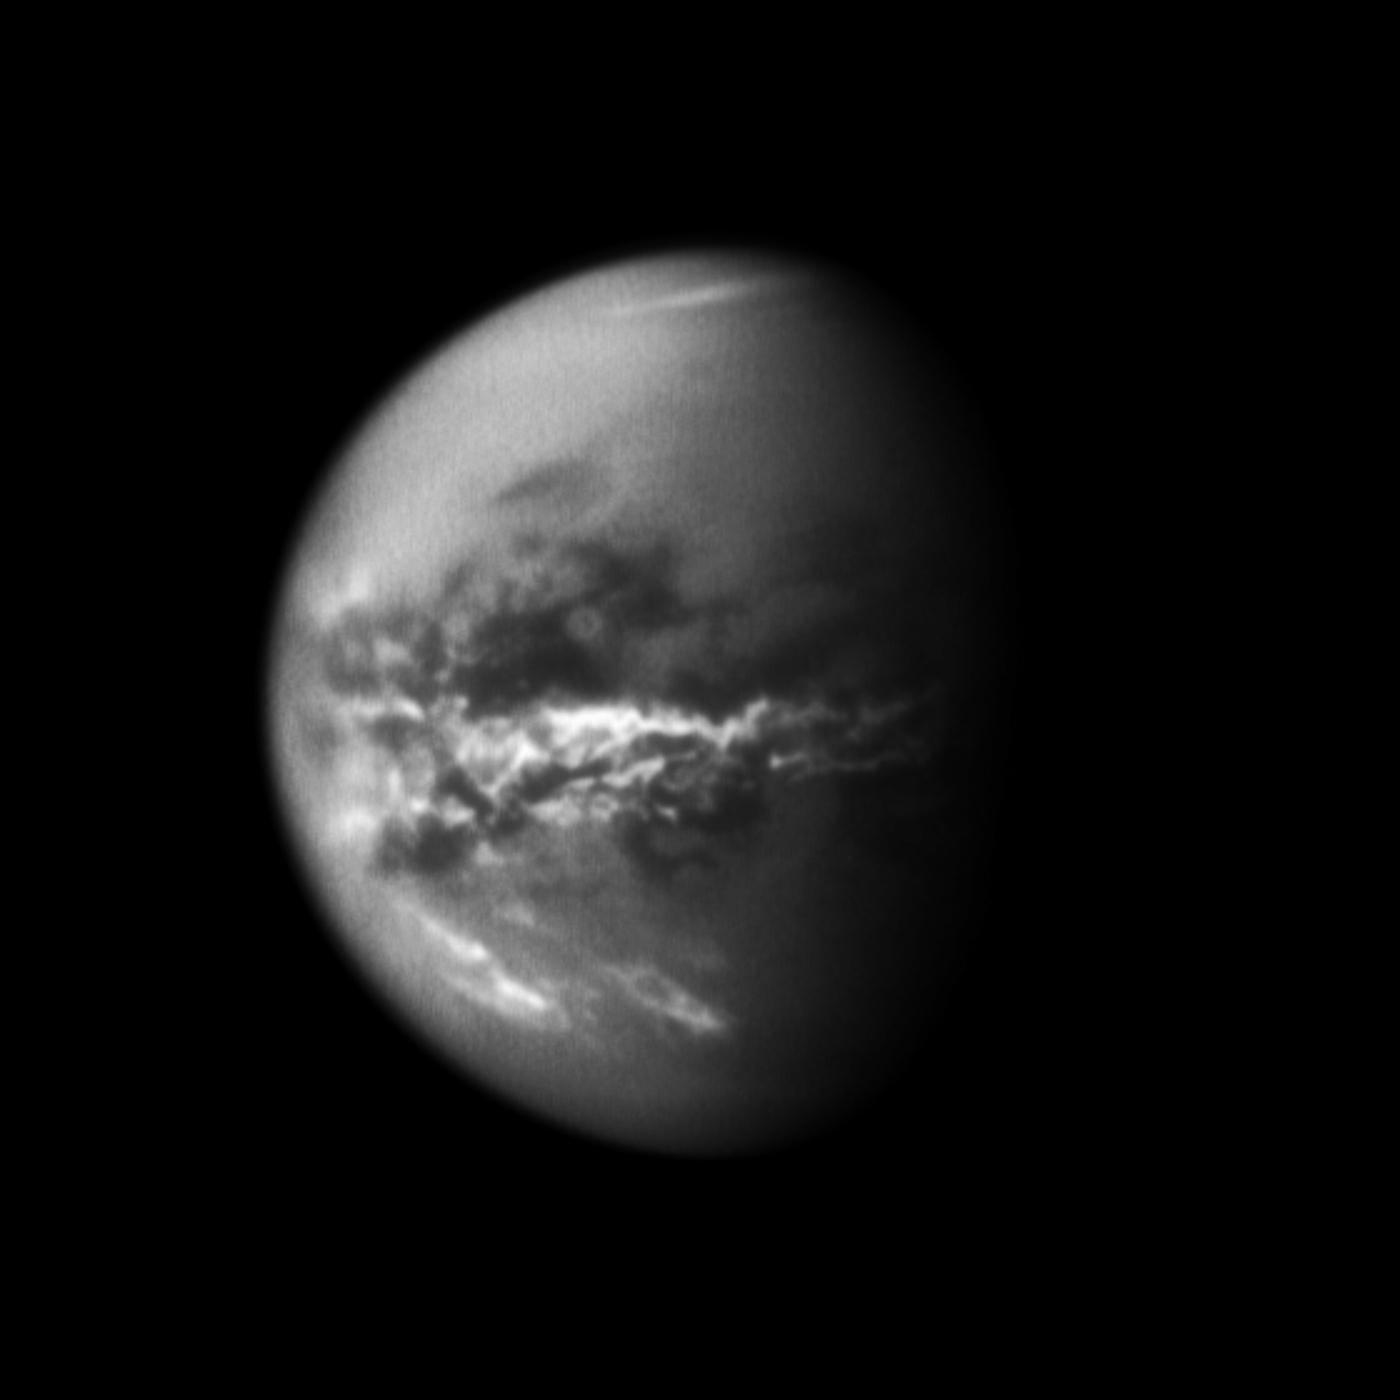 Titan - methane rain